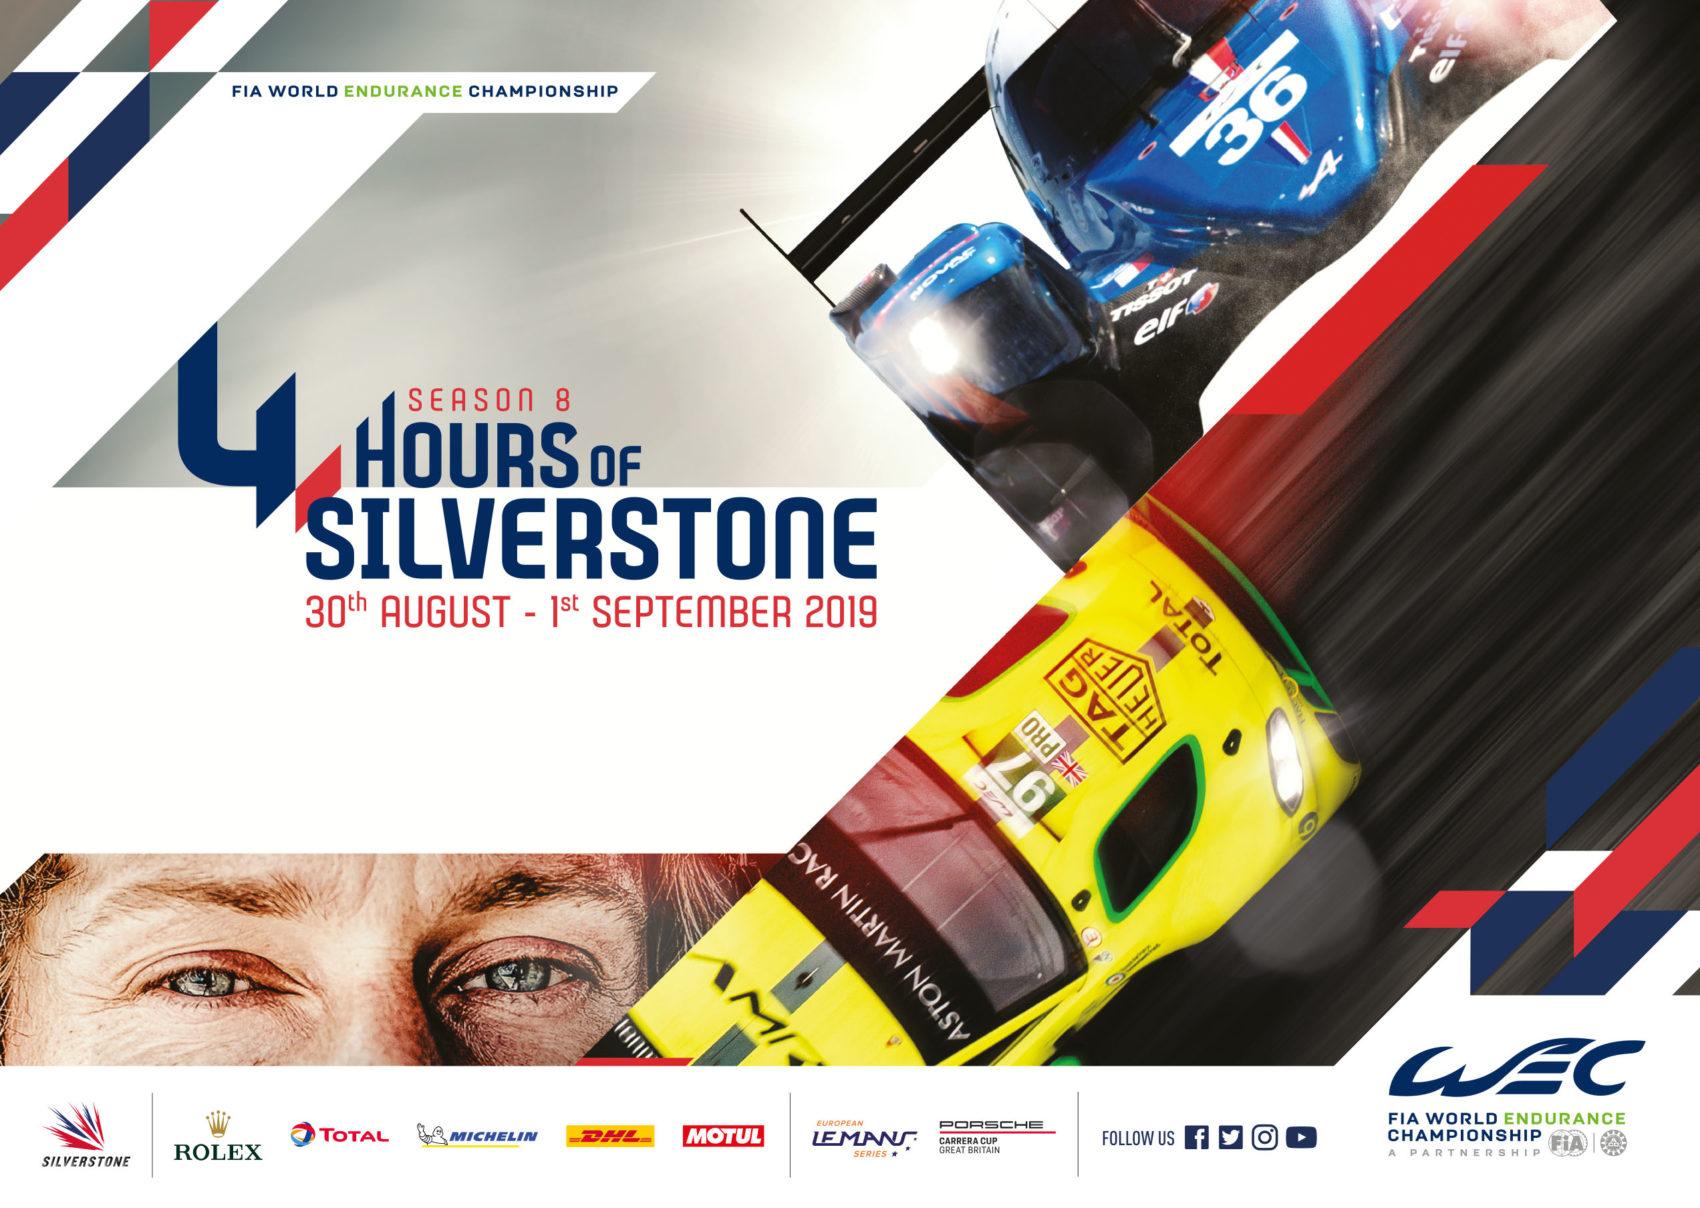 Projet_Project_WEC_FIA_world_endurance_championship_KV_silverstone